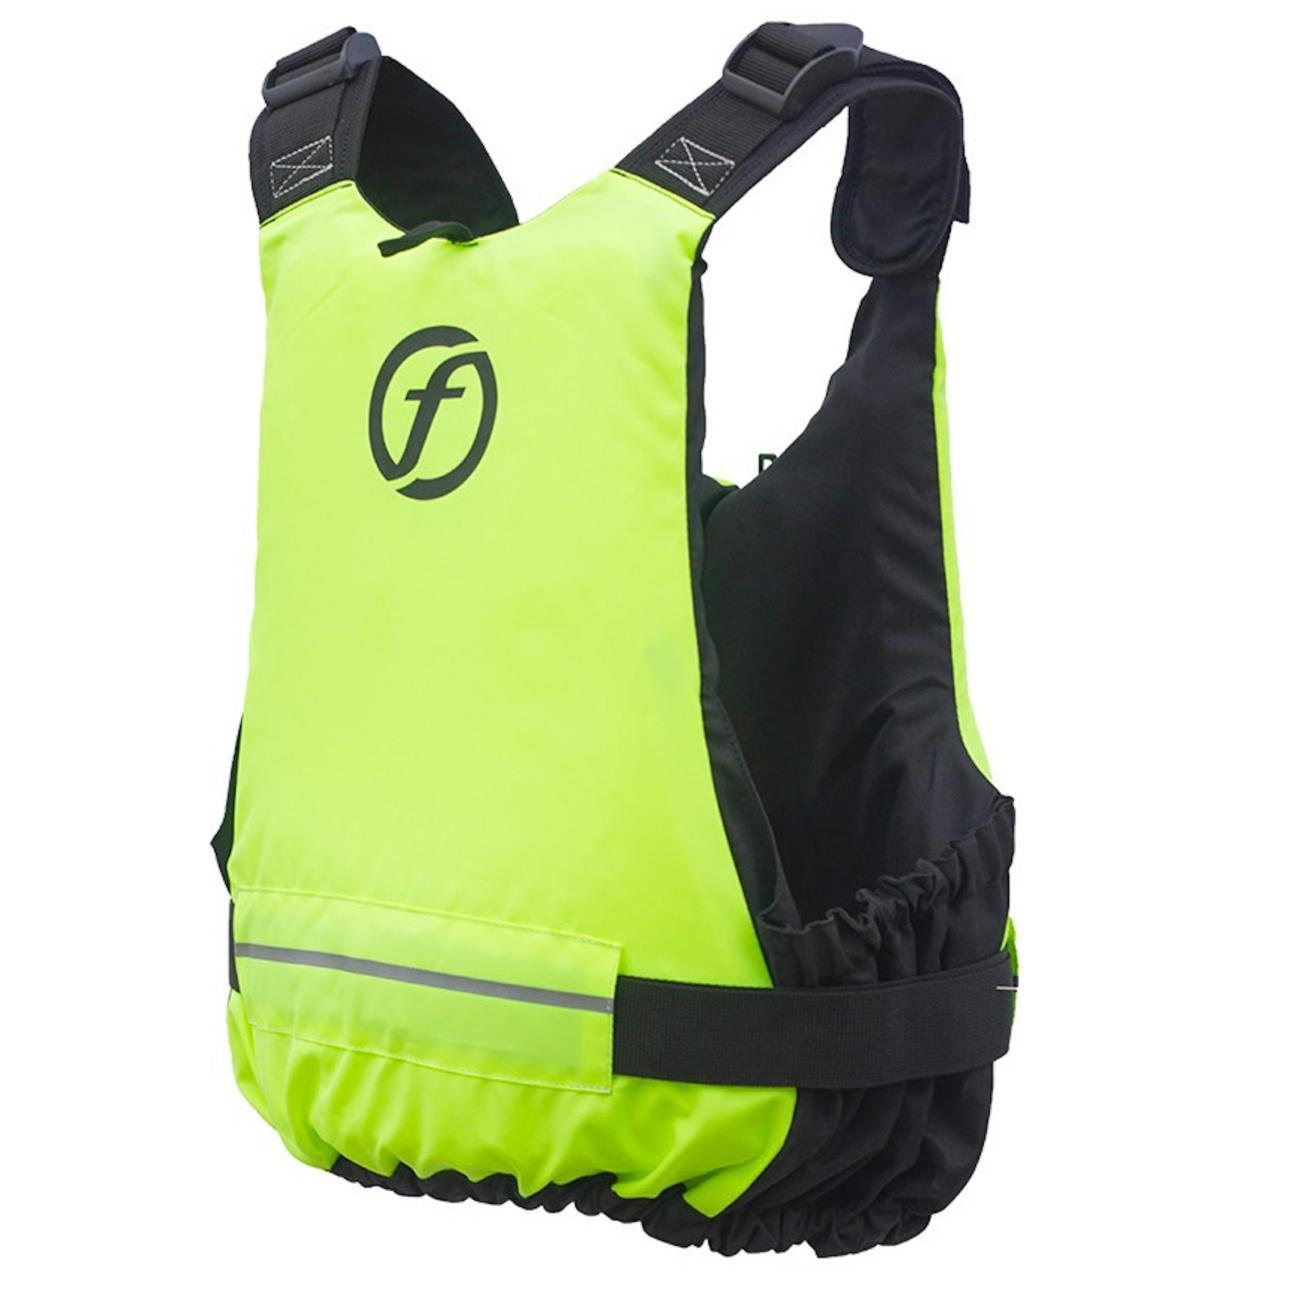 https://feelfreekayak.eu/1154-small_default/life-jacket-basic.jpg